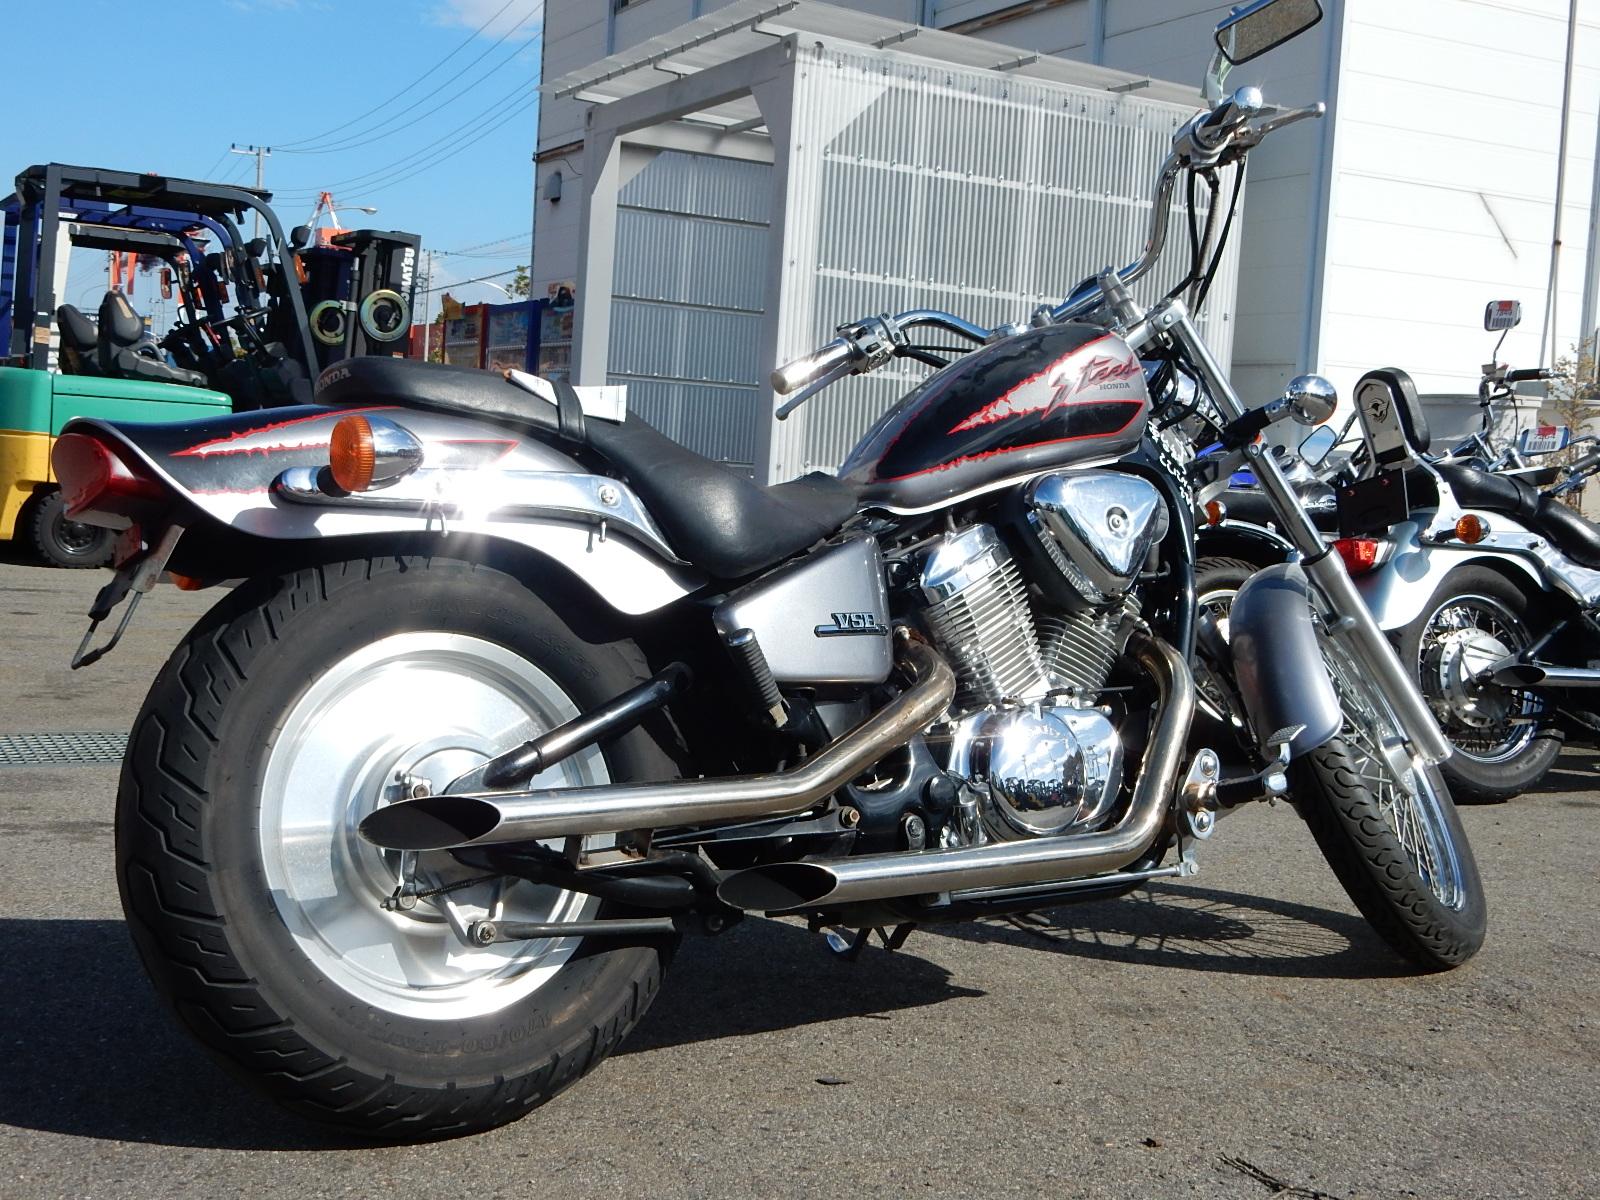 Мотоцикл Honda Steed (Хонда Стид) 400 — обзор и технические характеристики модели